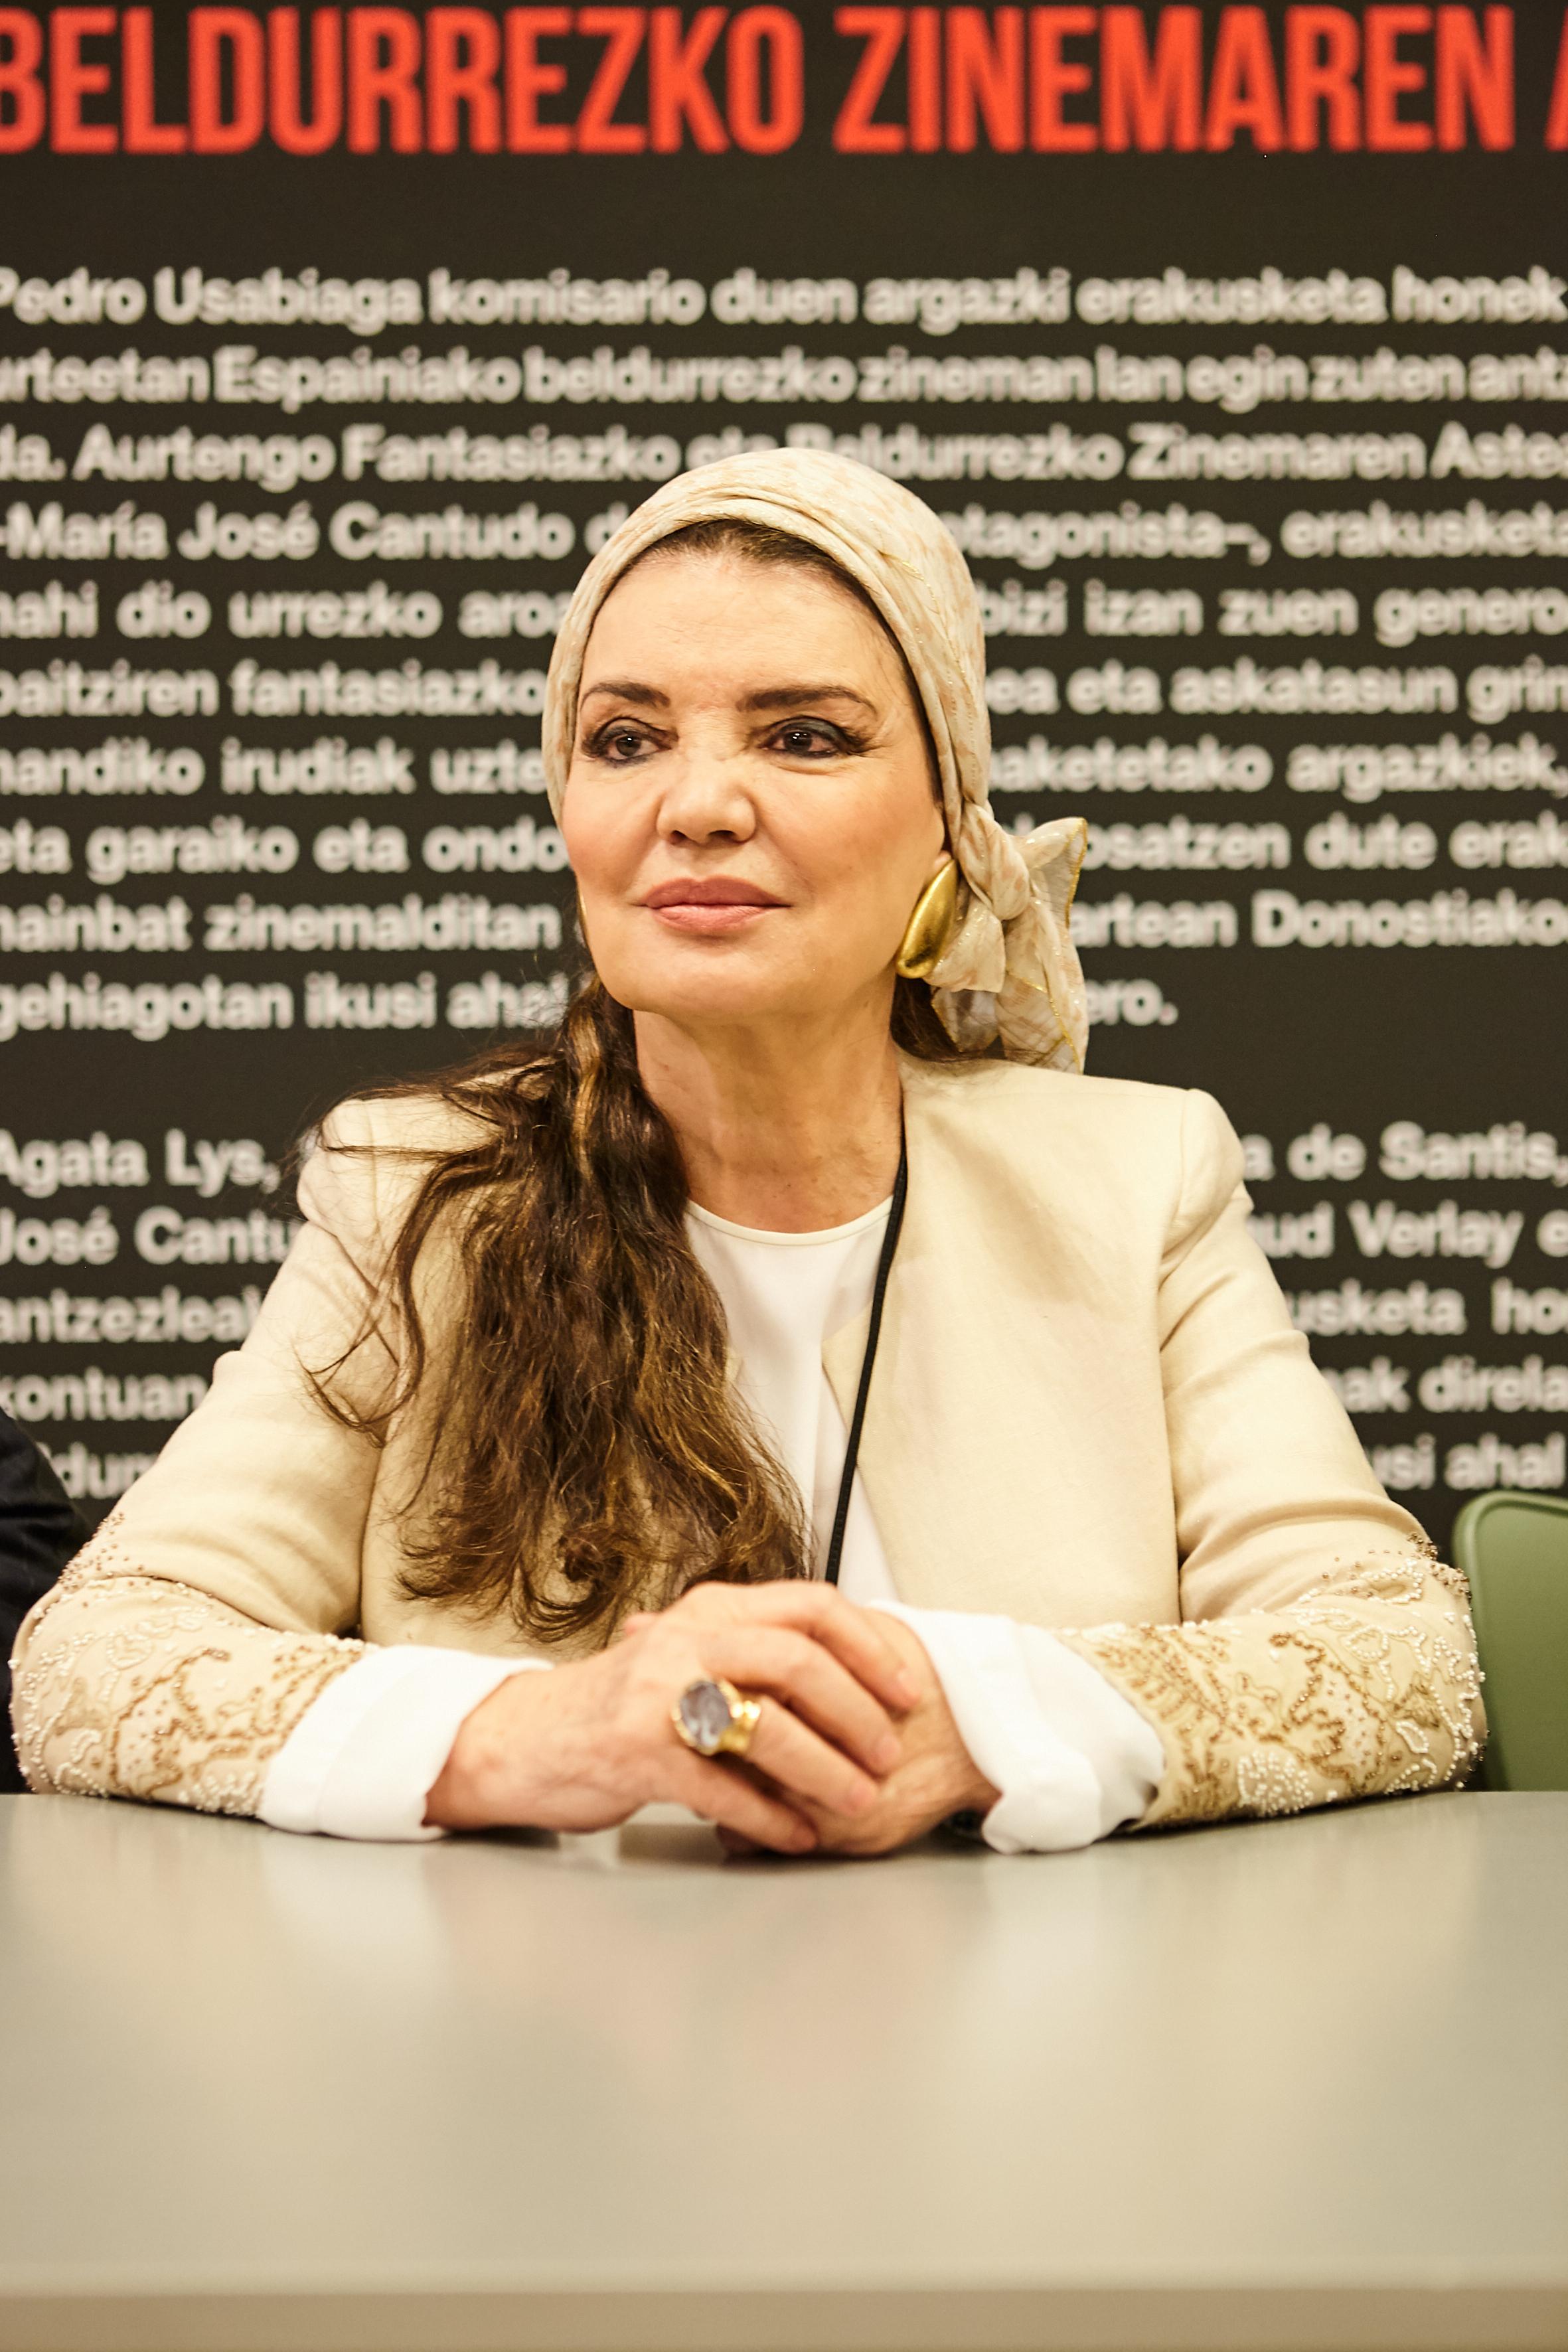 Agata Lys